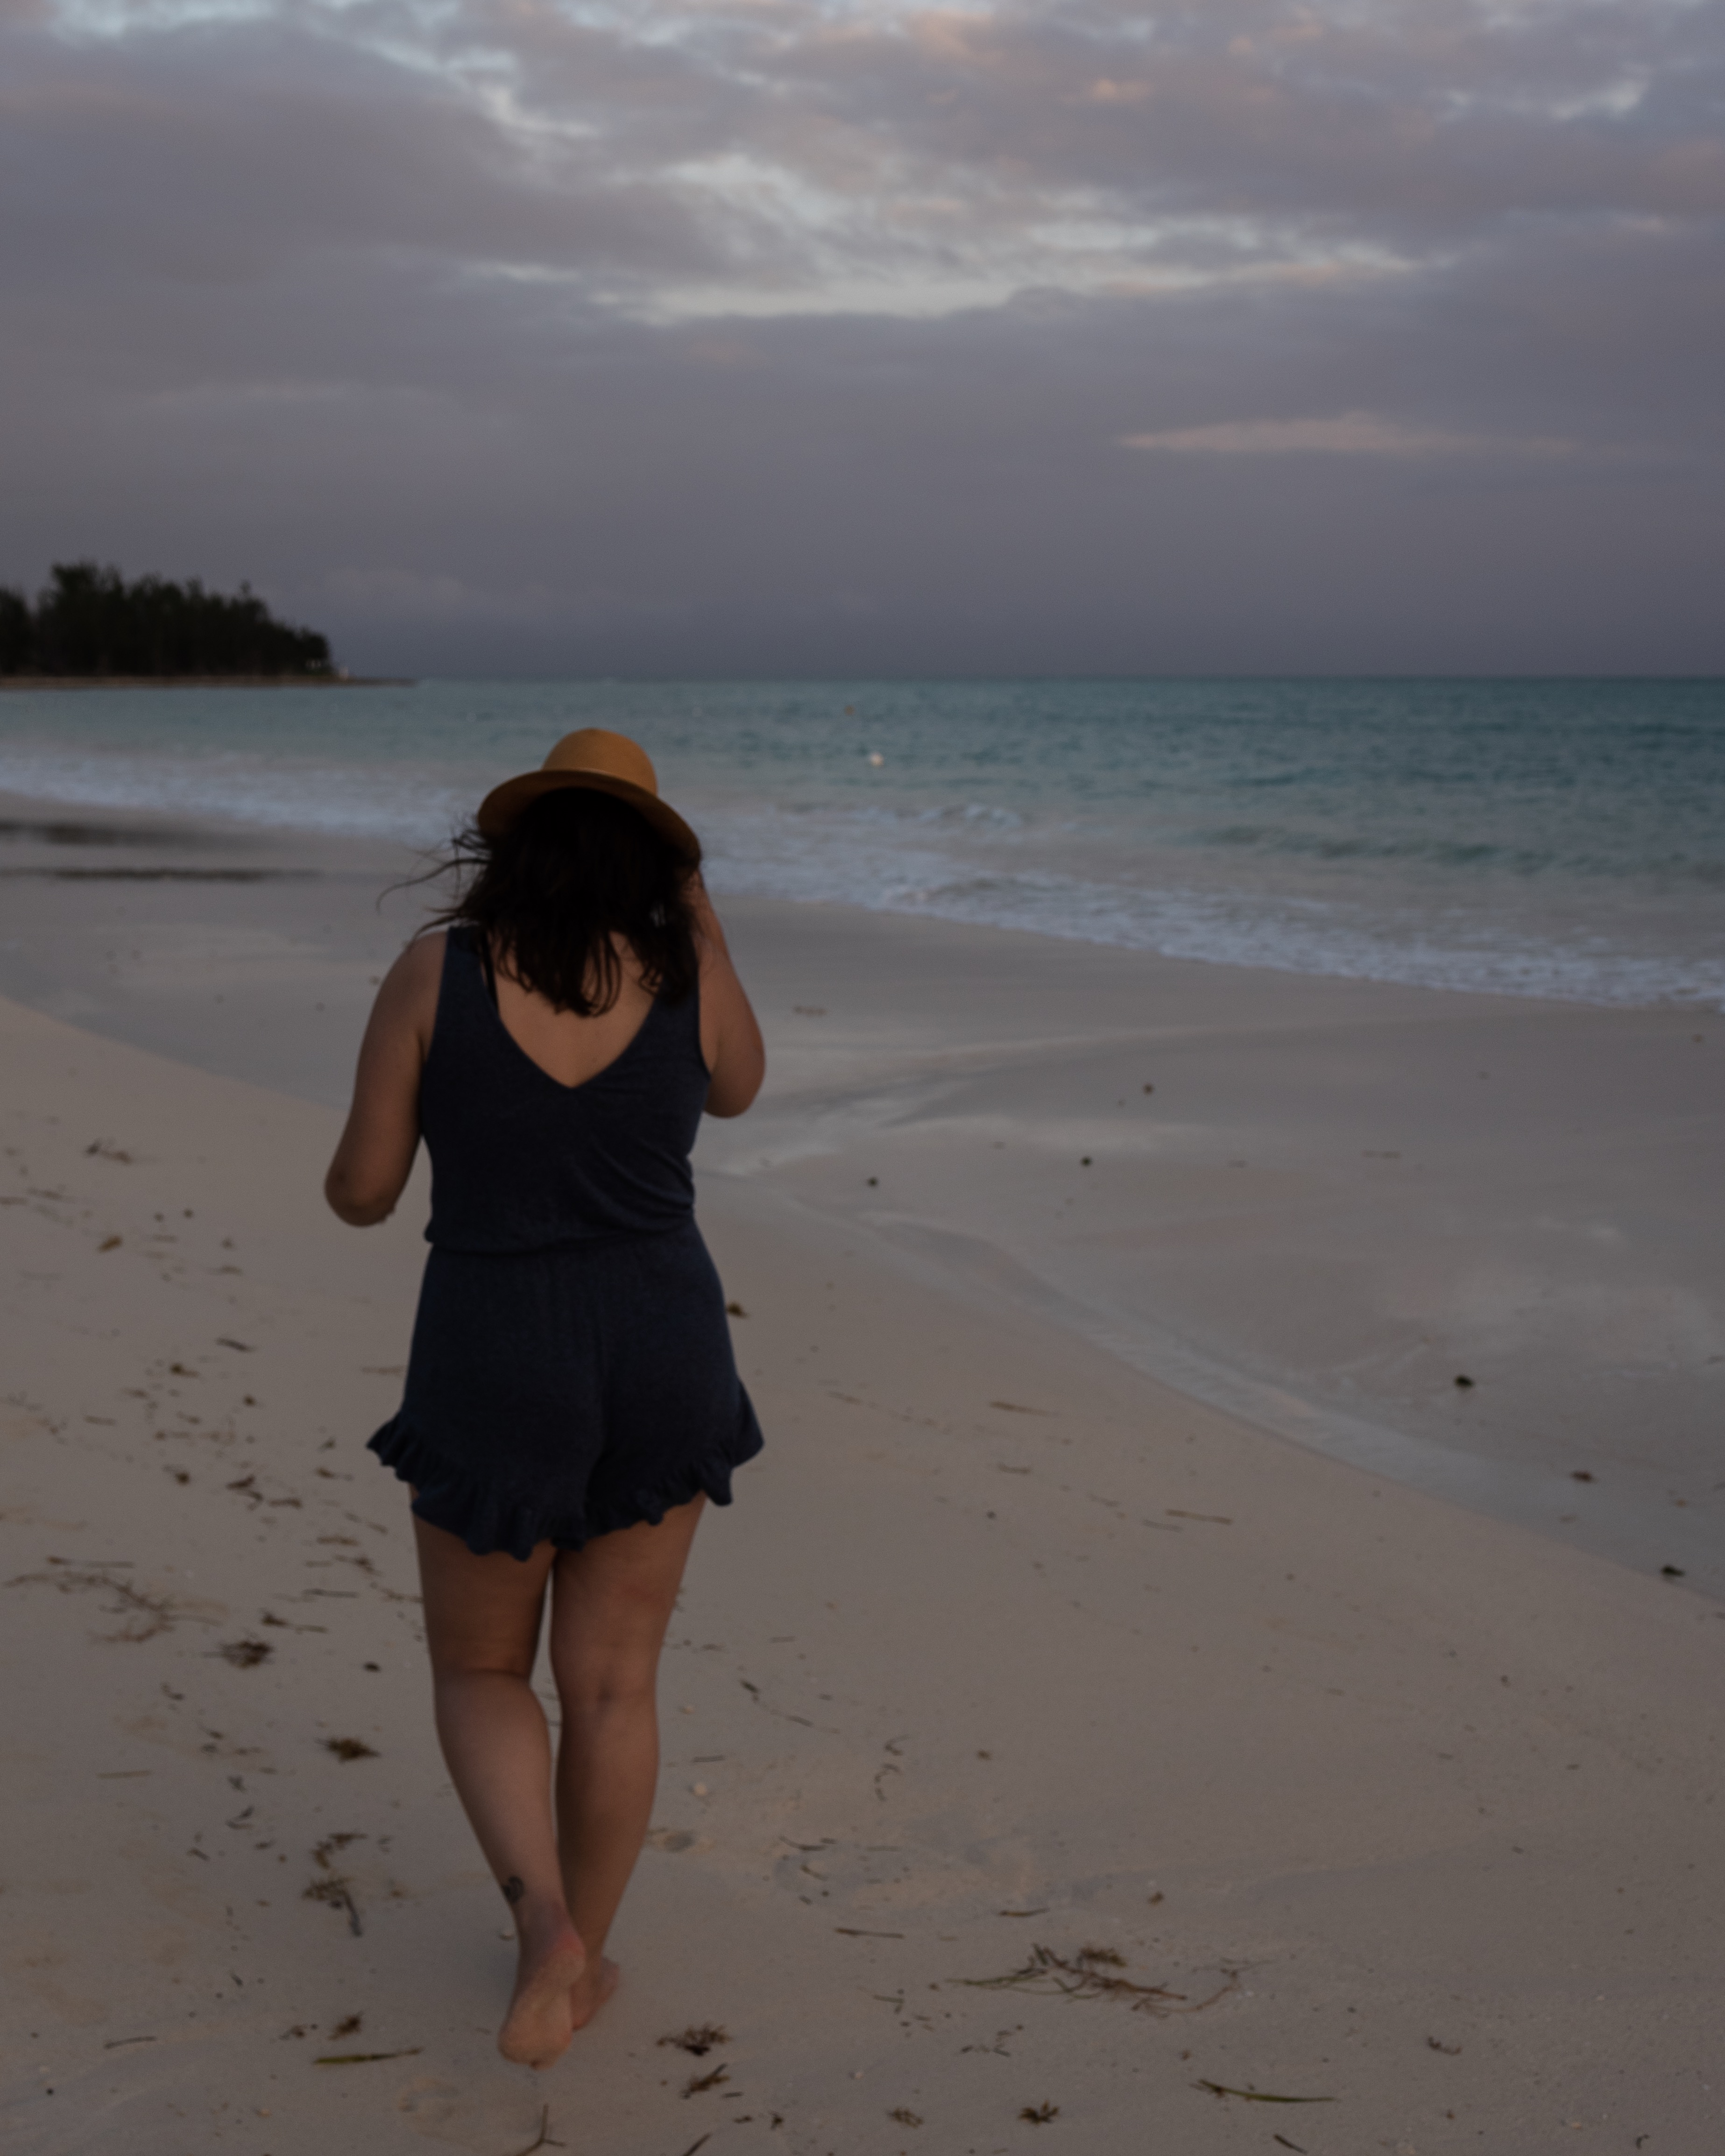 Walking the shore after sunset at Taino Beach, Freeport, Bahamas